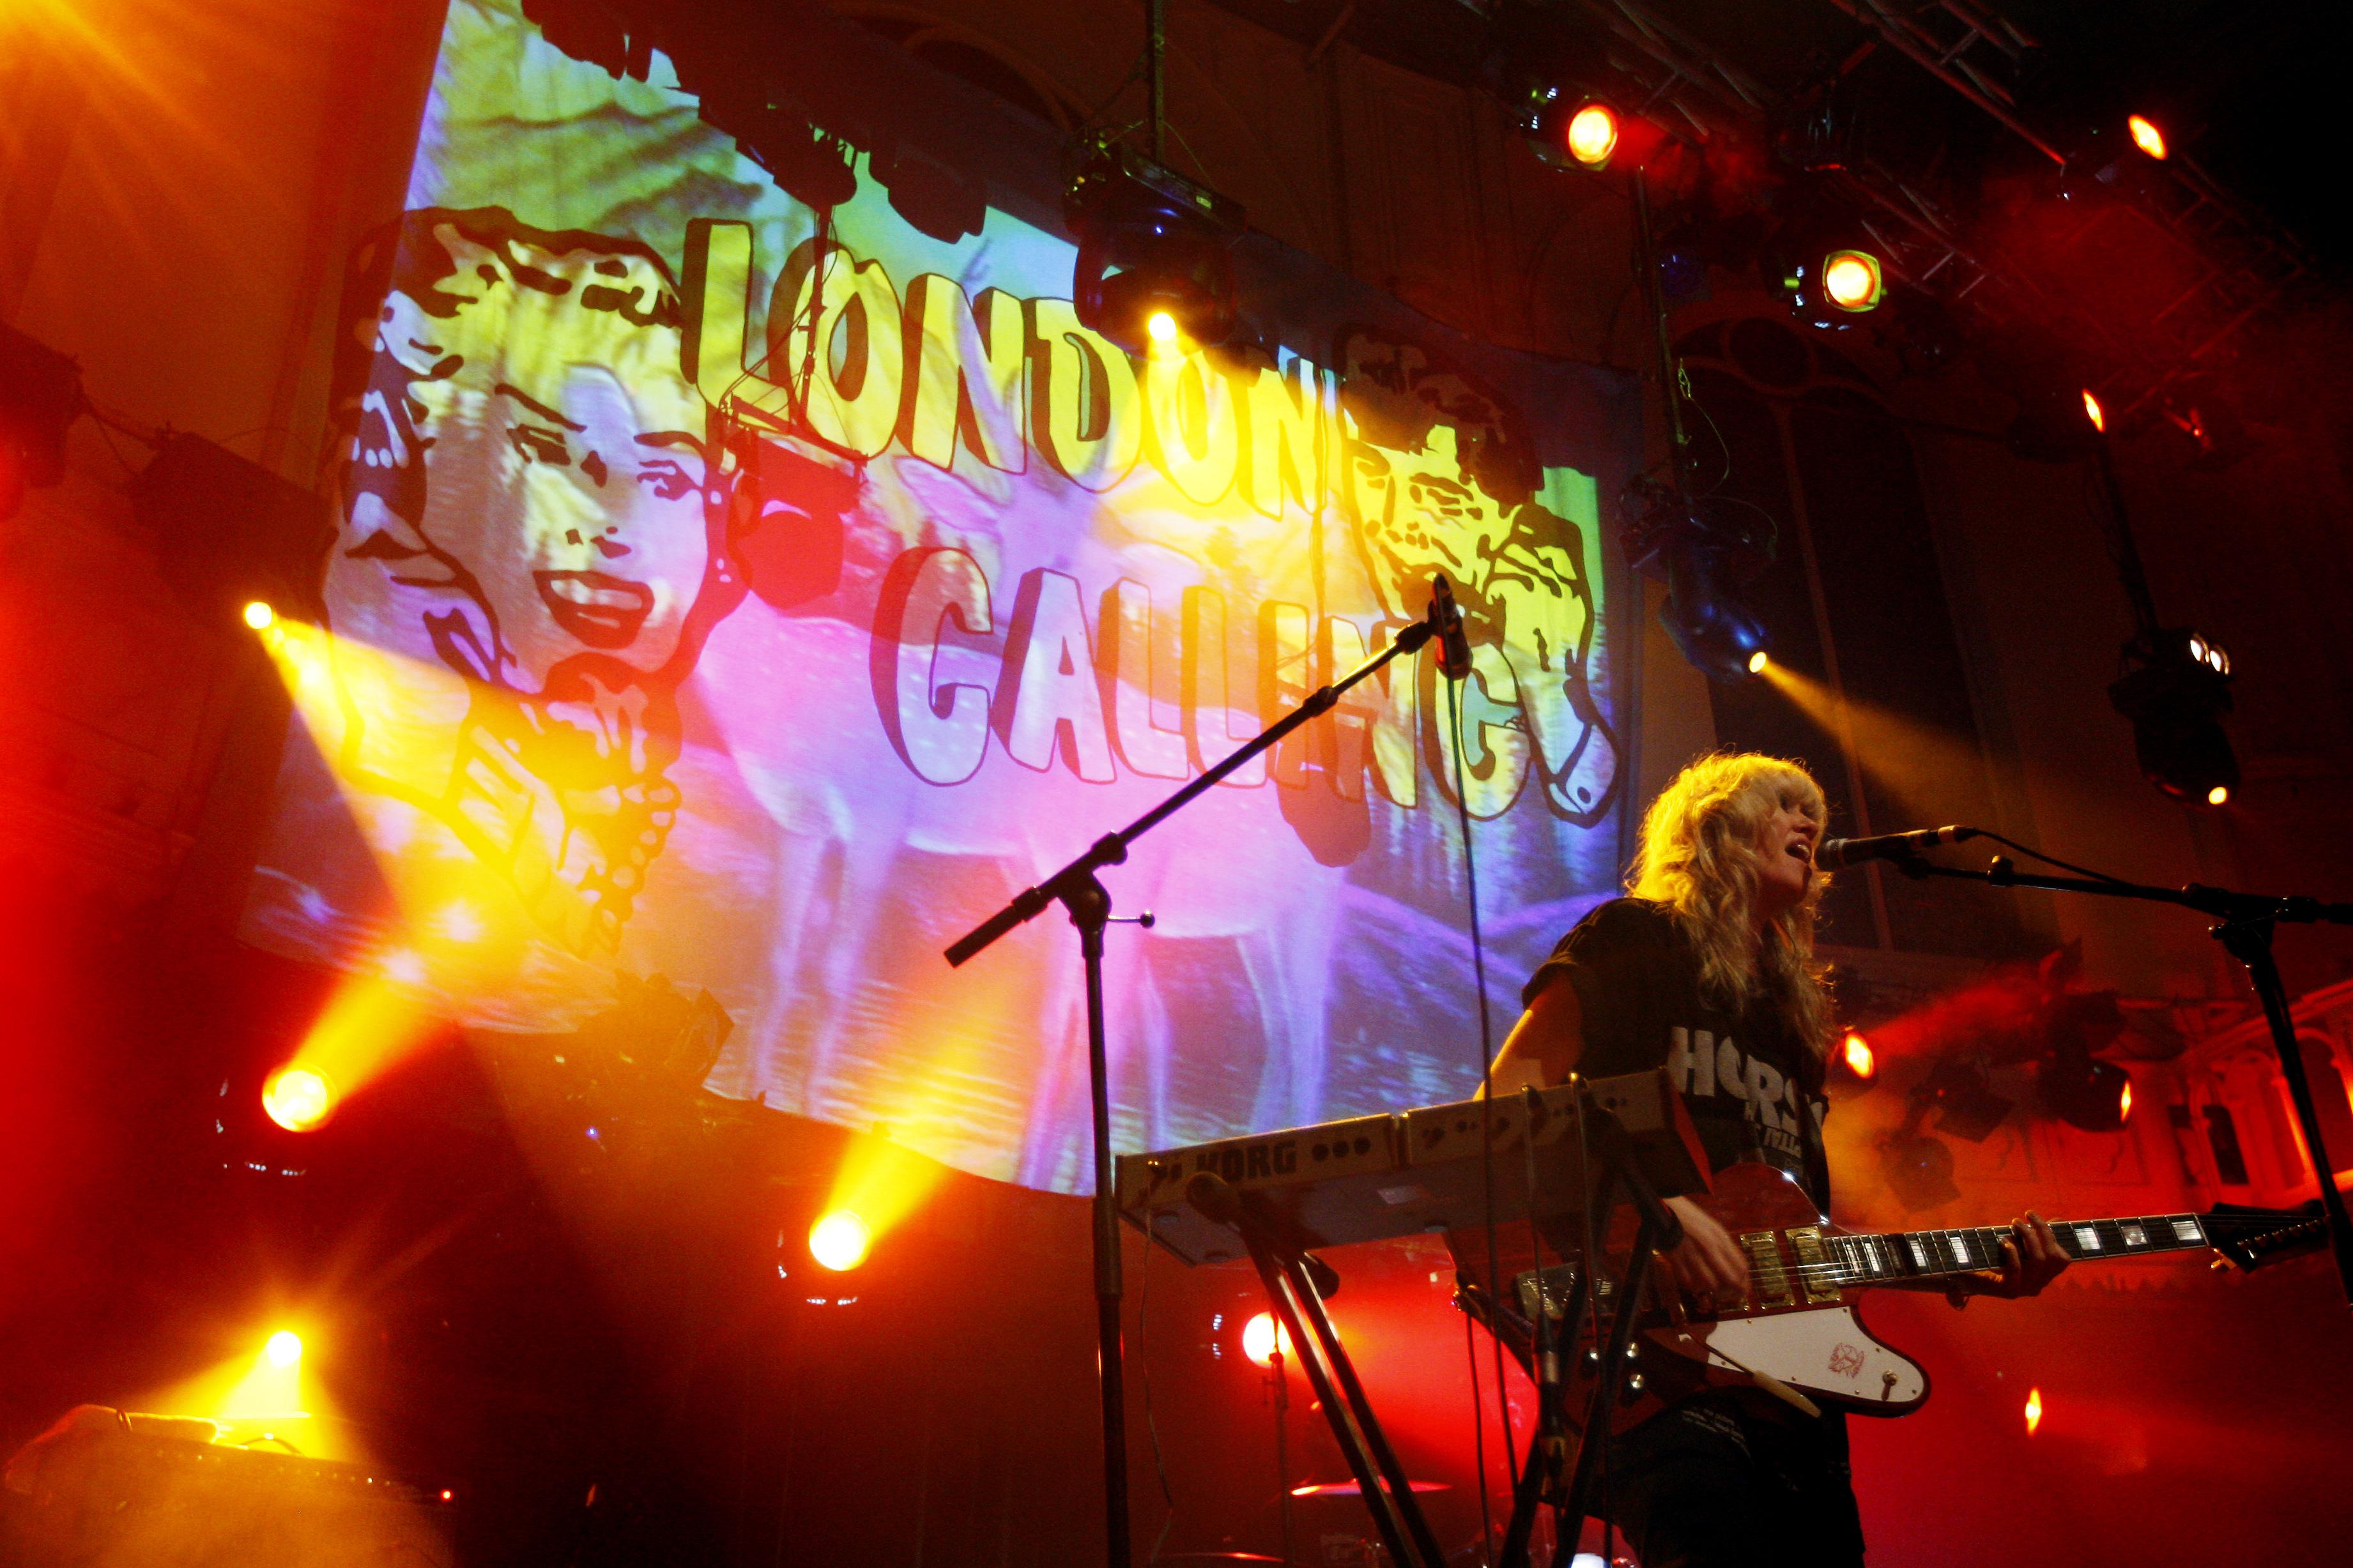 London Calling Festival